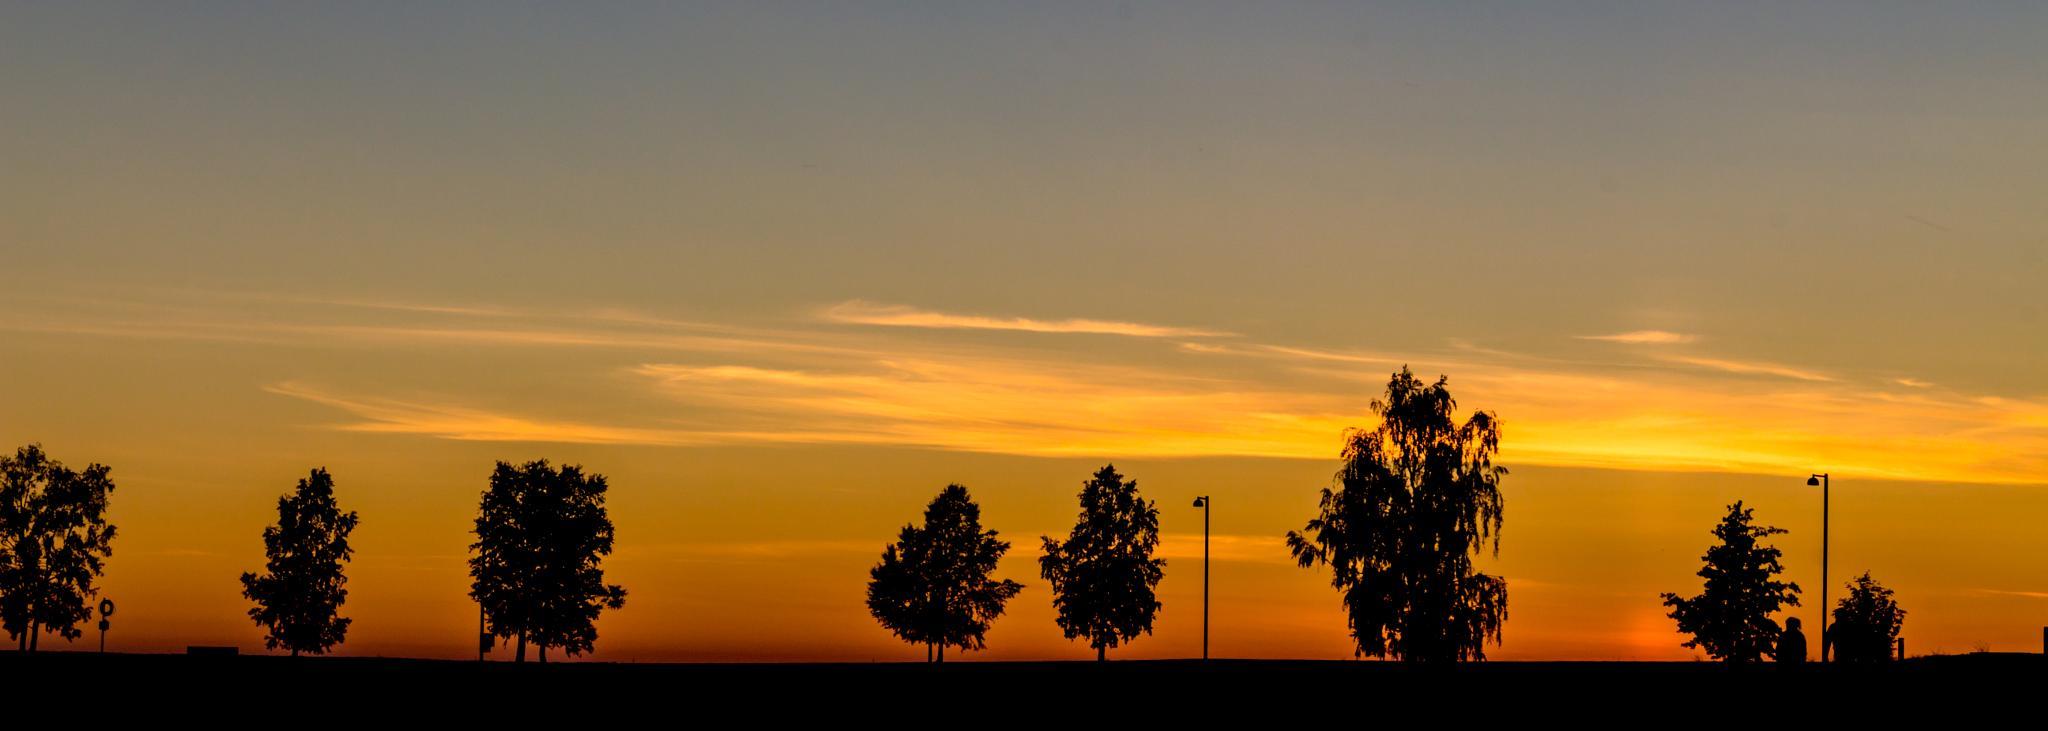 Photo in Landscape #oulu #silhouette #sunset #night #evening #summer #finland #canon #eos #700d #sami #tiainen #samitintti